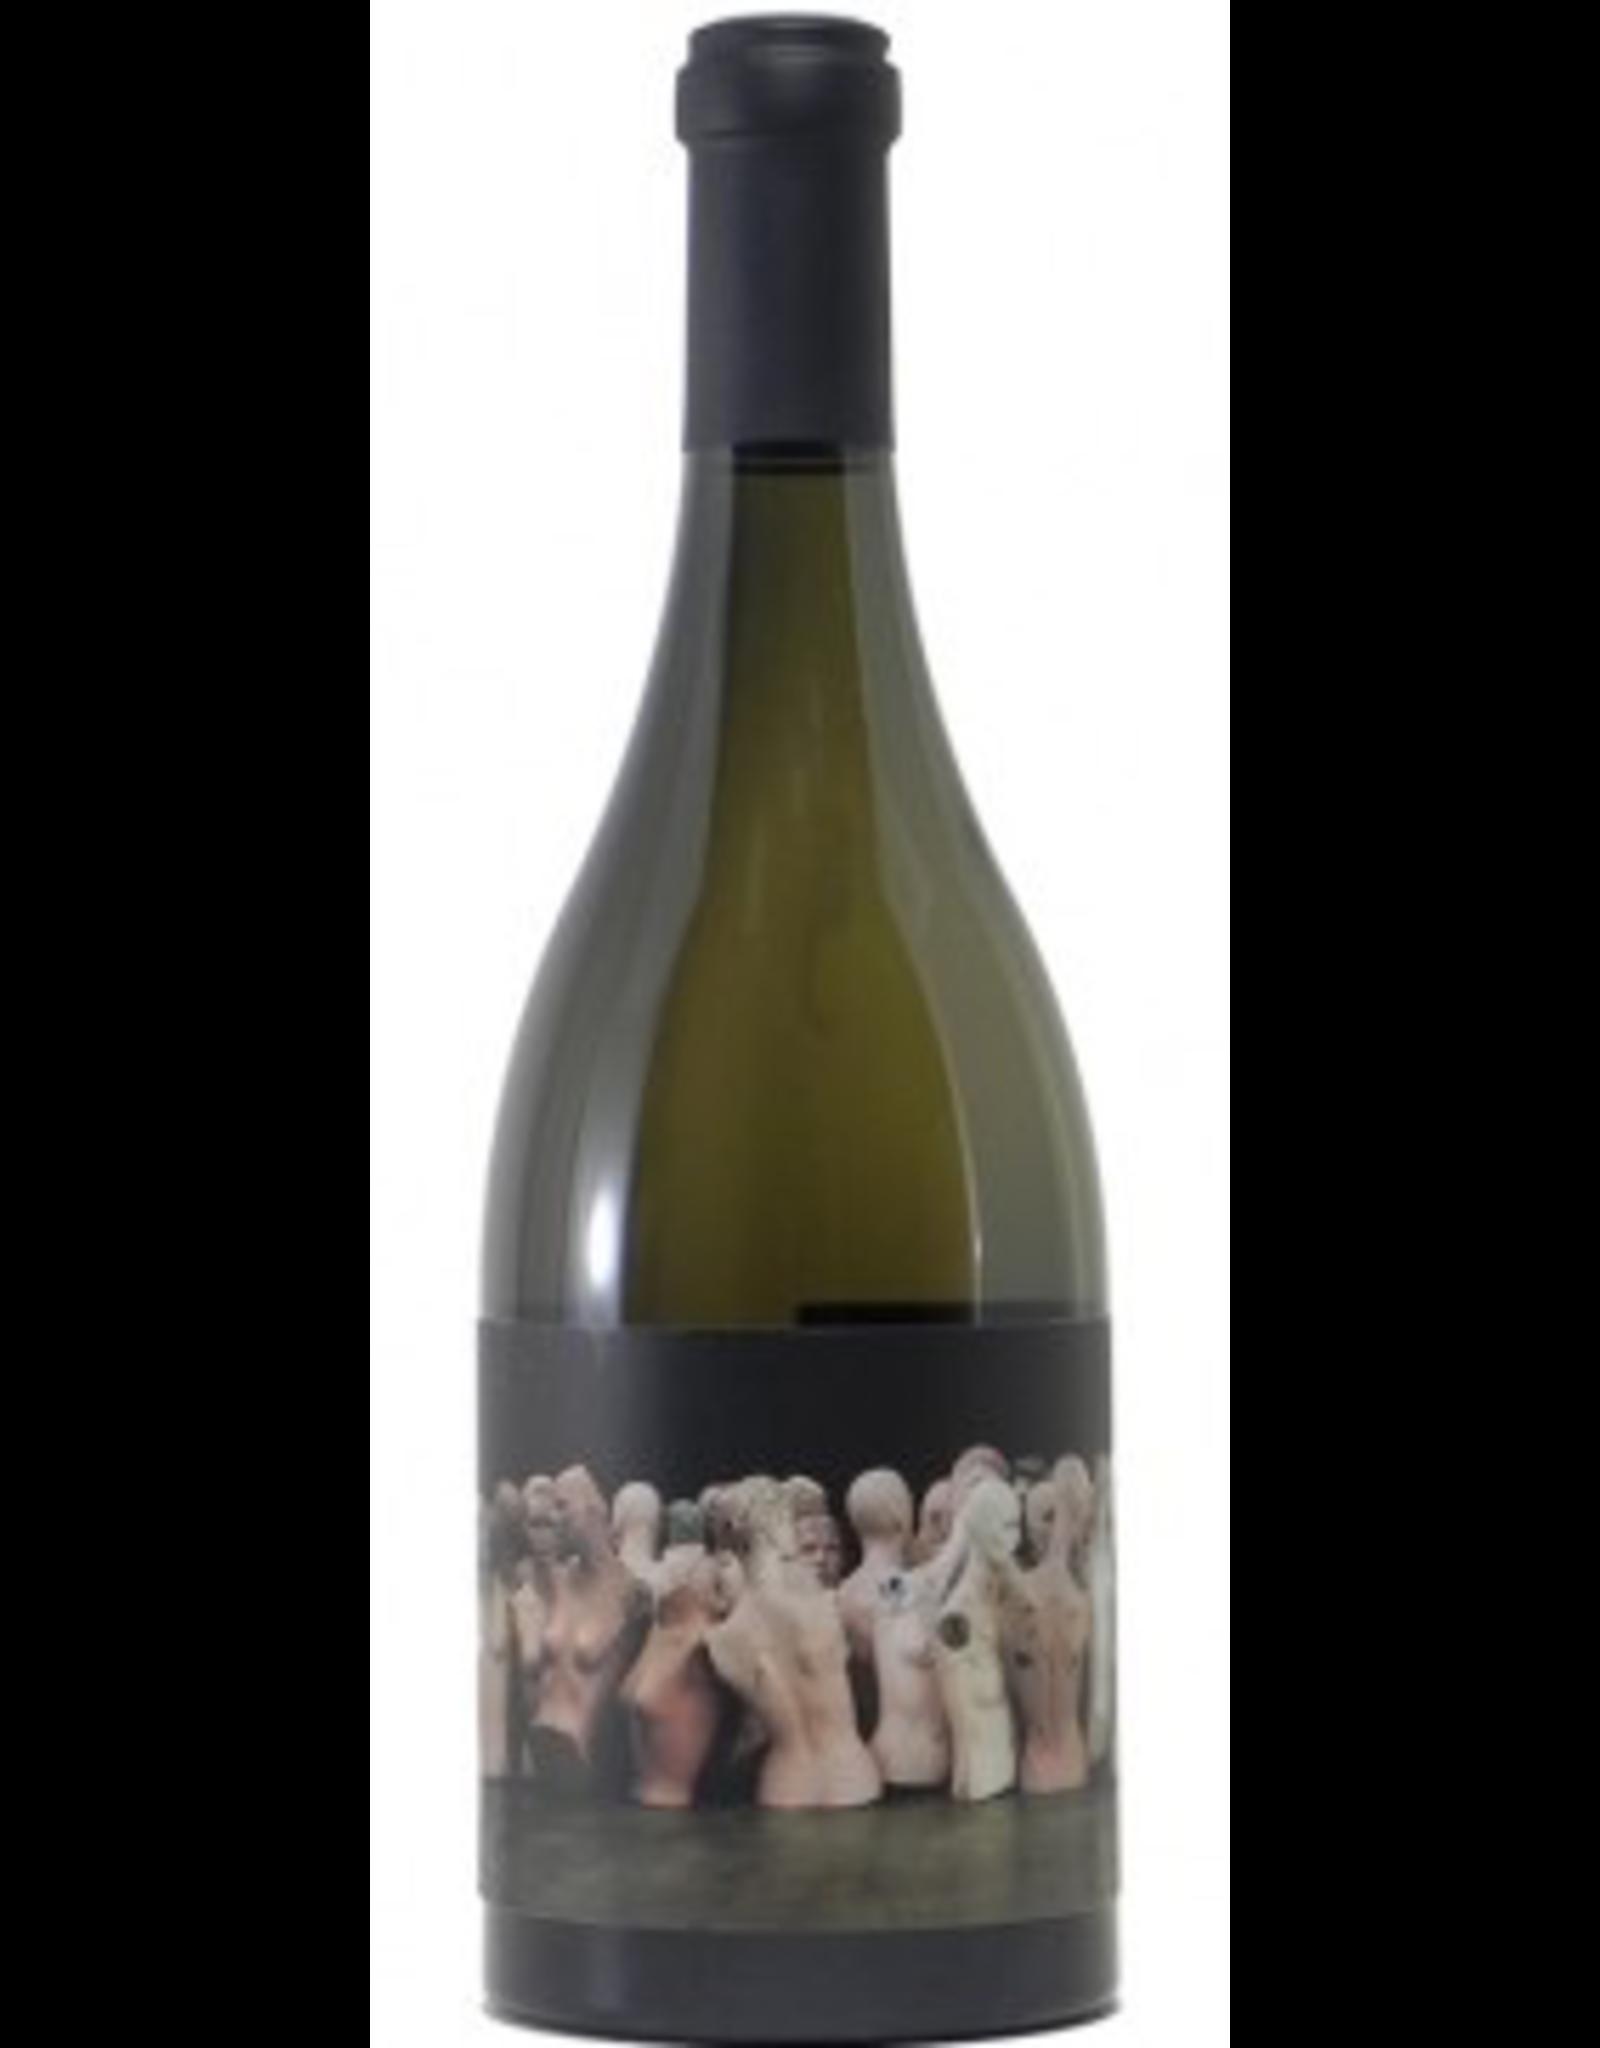 White Wine 2018, Orin Swift Mannequin, Chardonnay Blend, Rutherford, Napa Valley, California, 15.5% Alc, CTnr